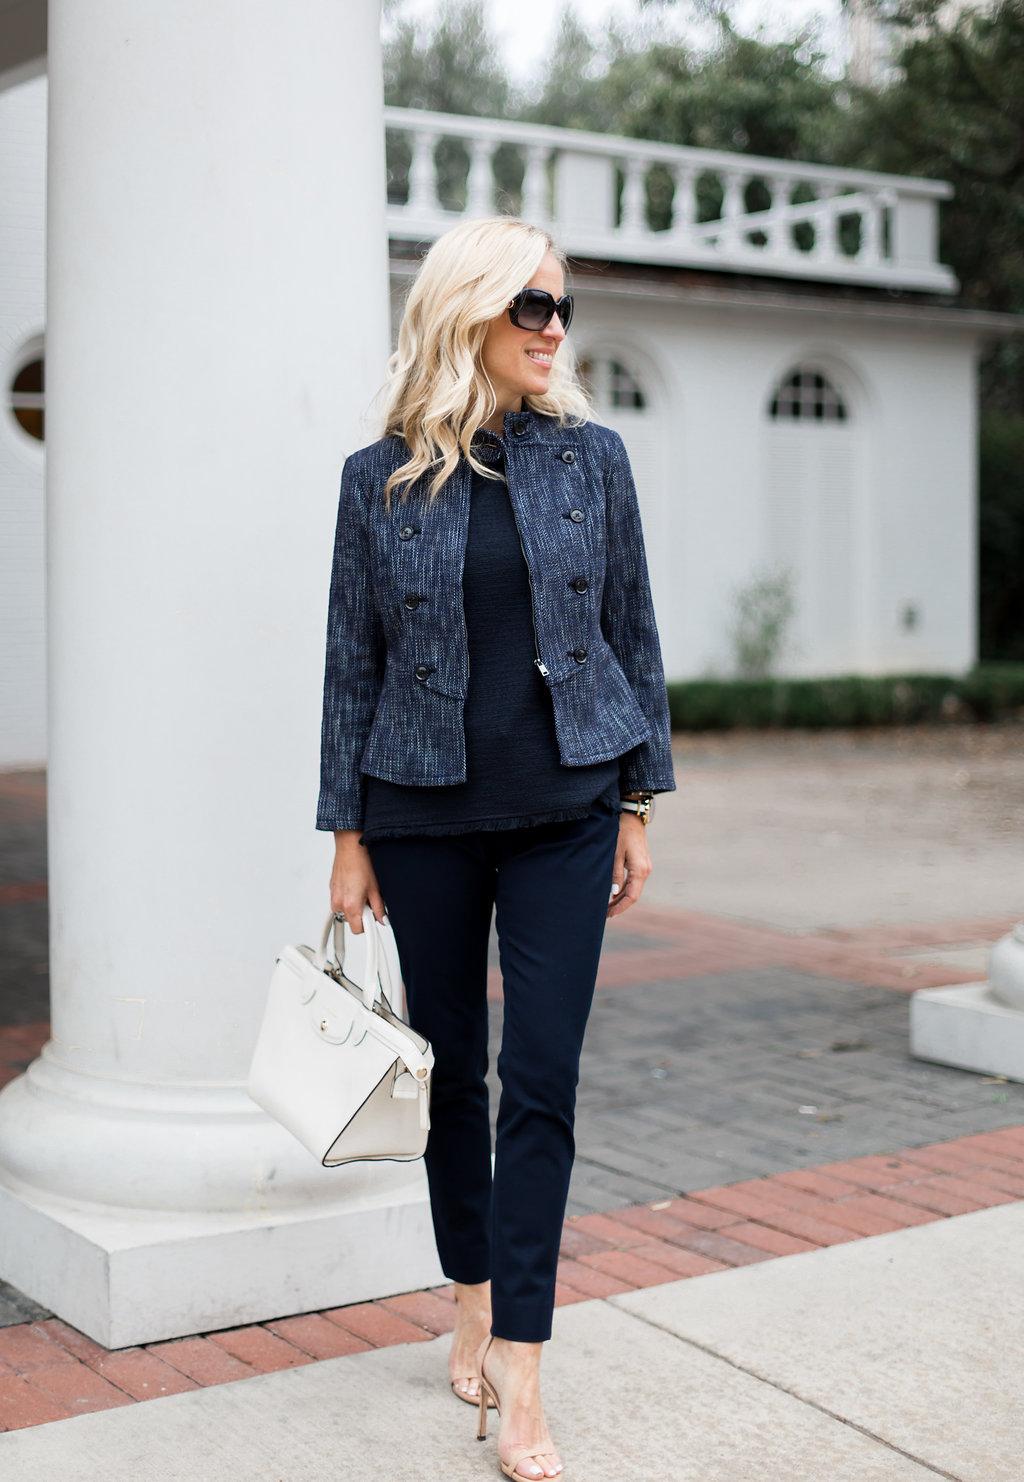 Versatile Wardrobe Staple   Introducing the Sloan Pant